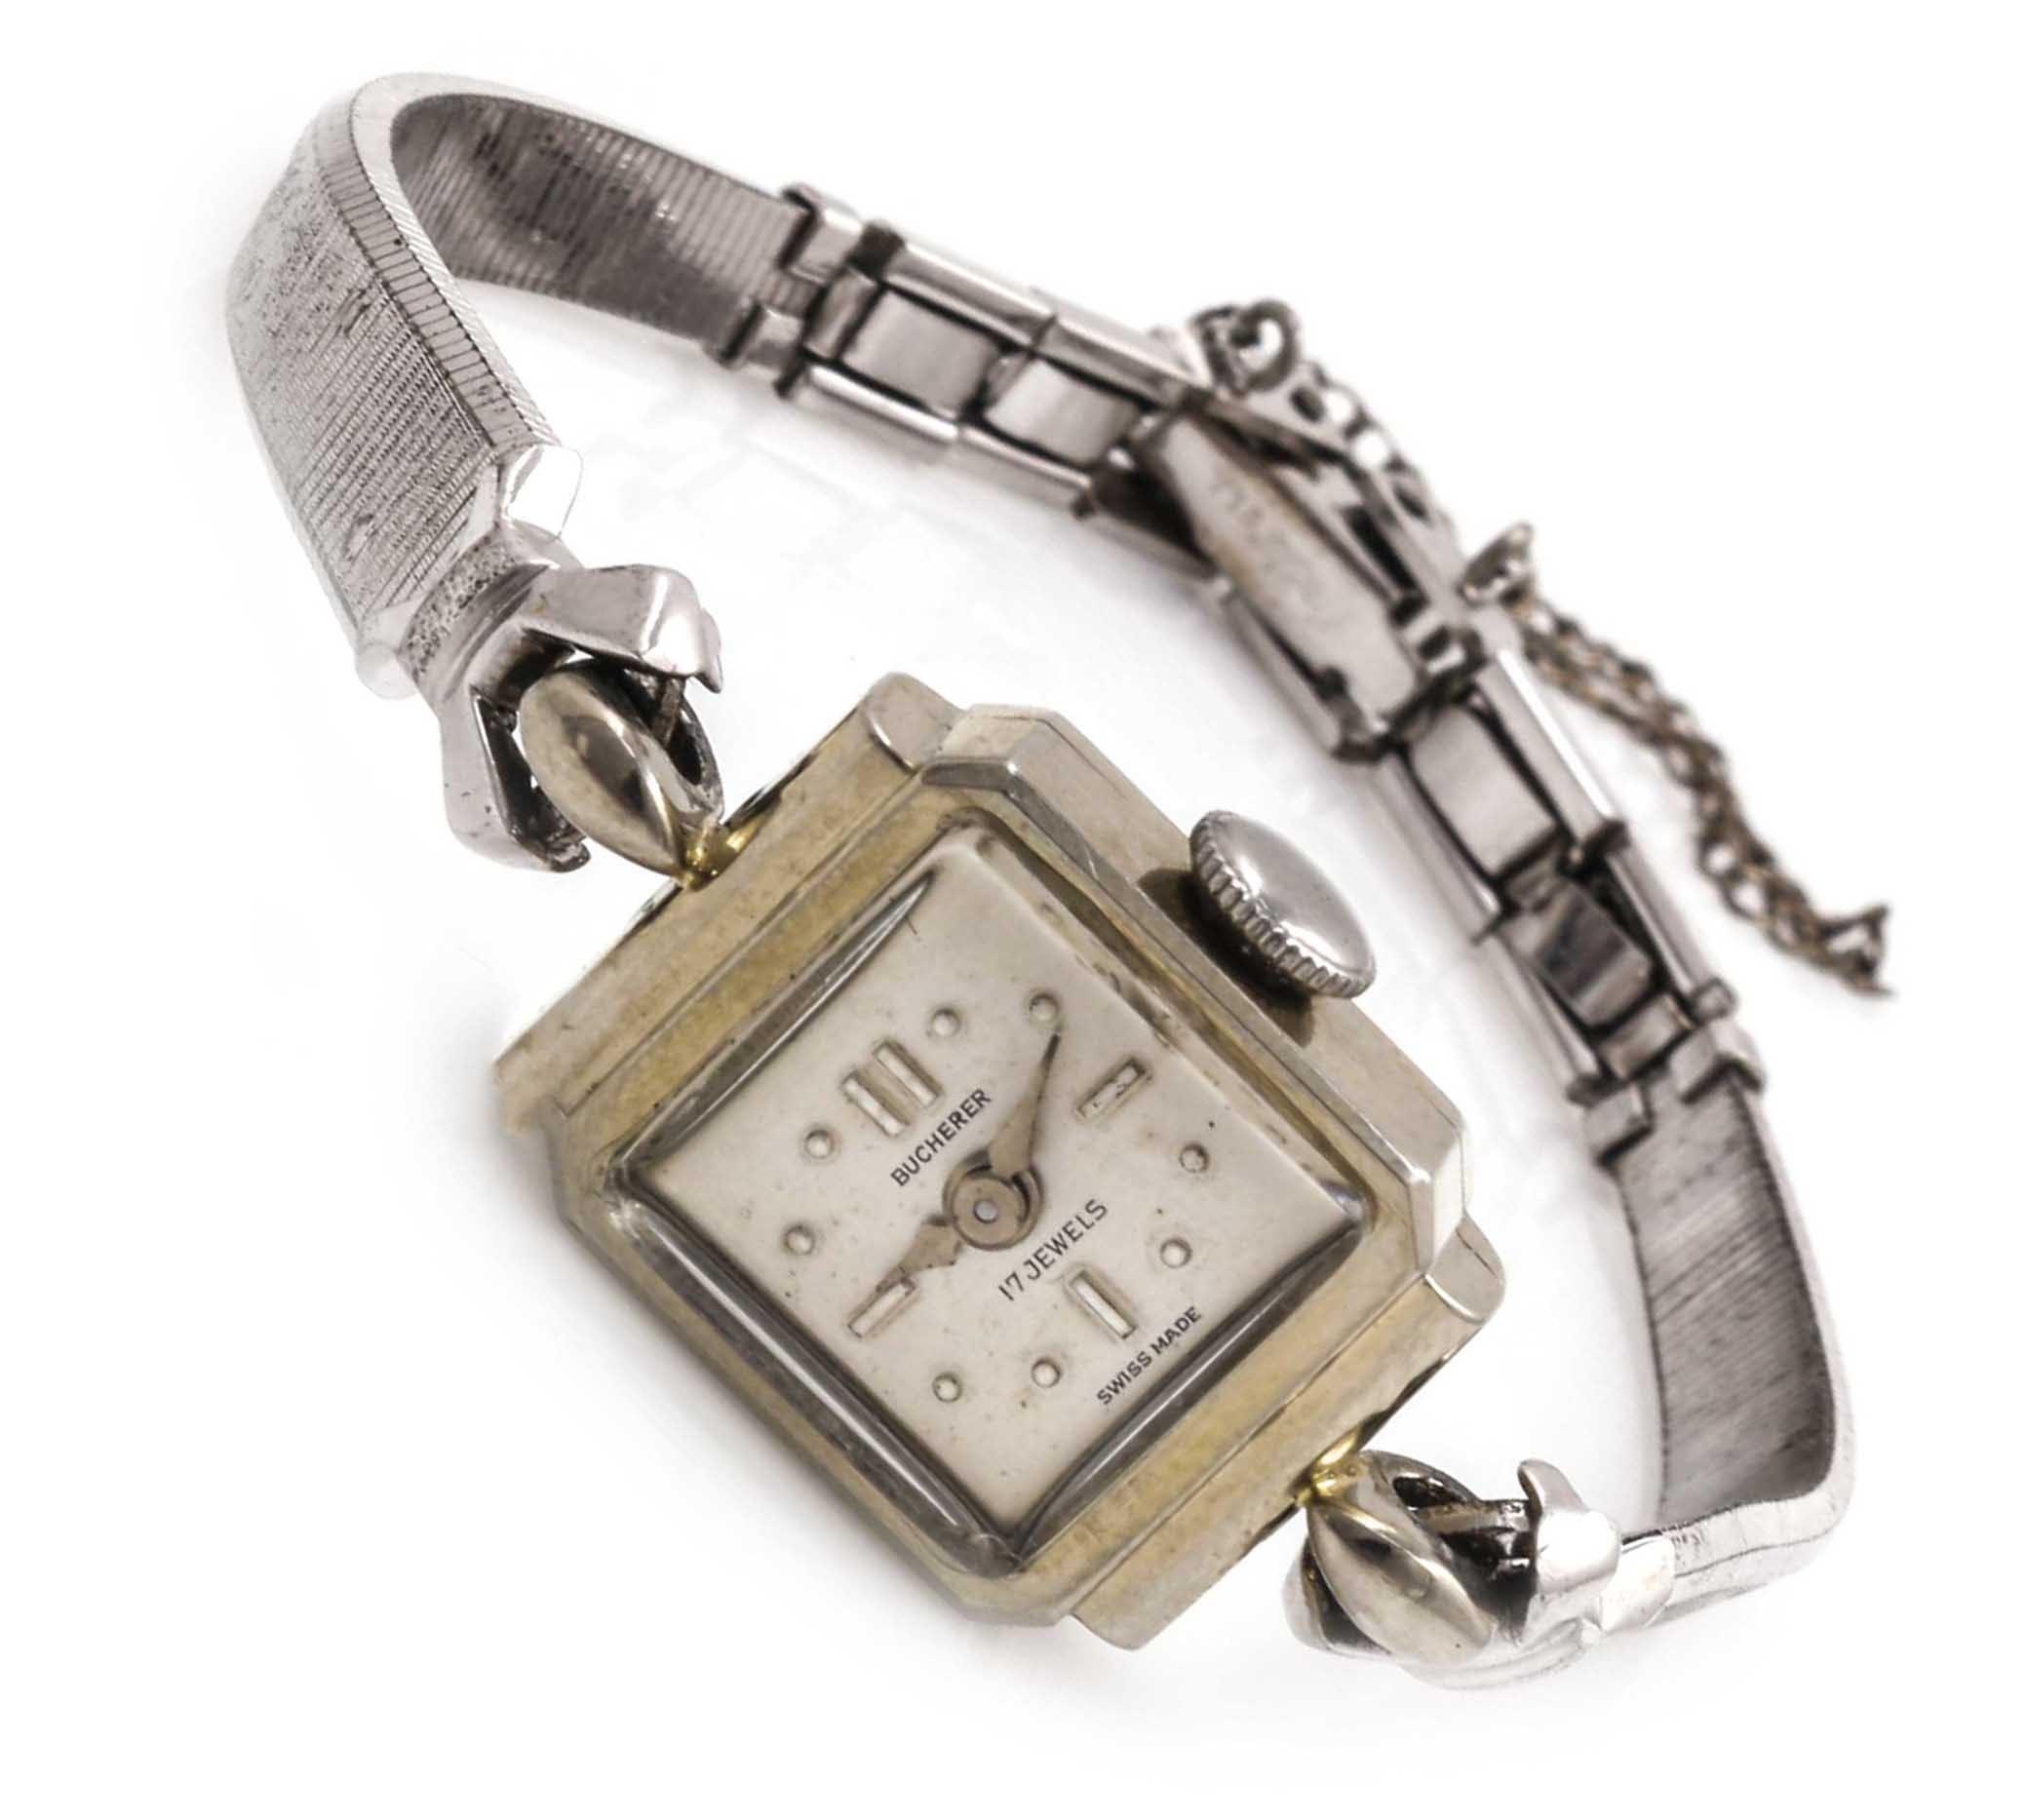 18K White Gold Bucherer Wristwatch